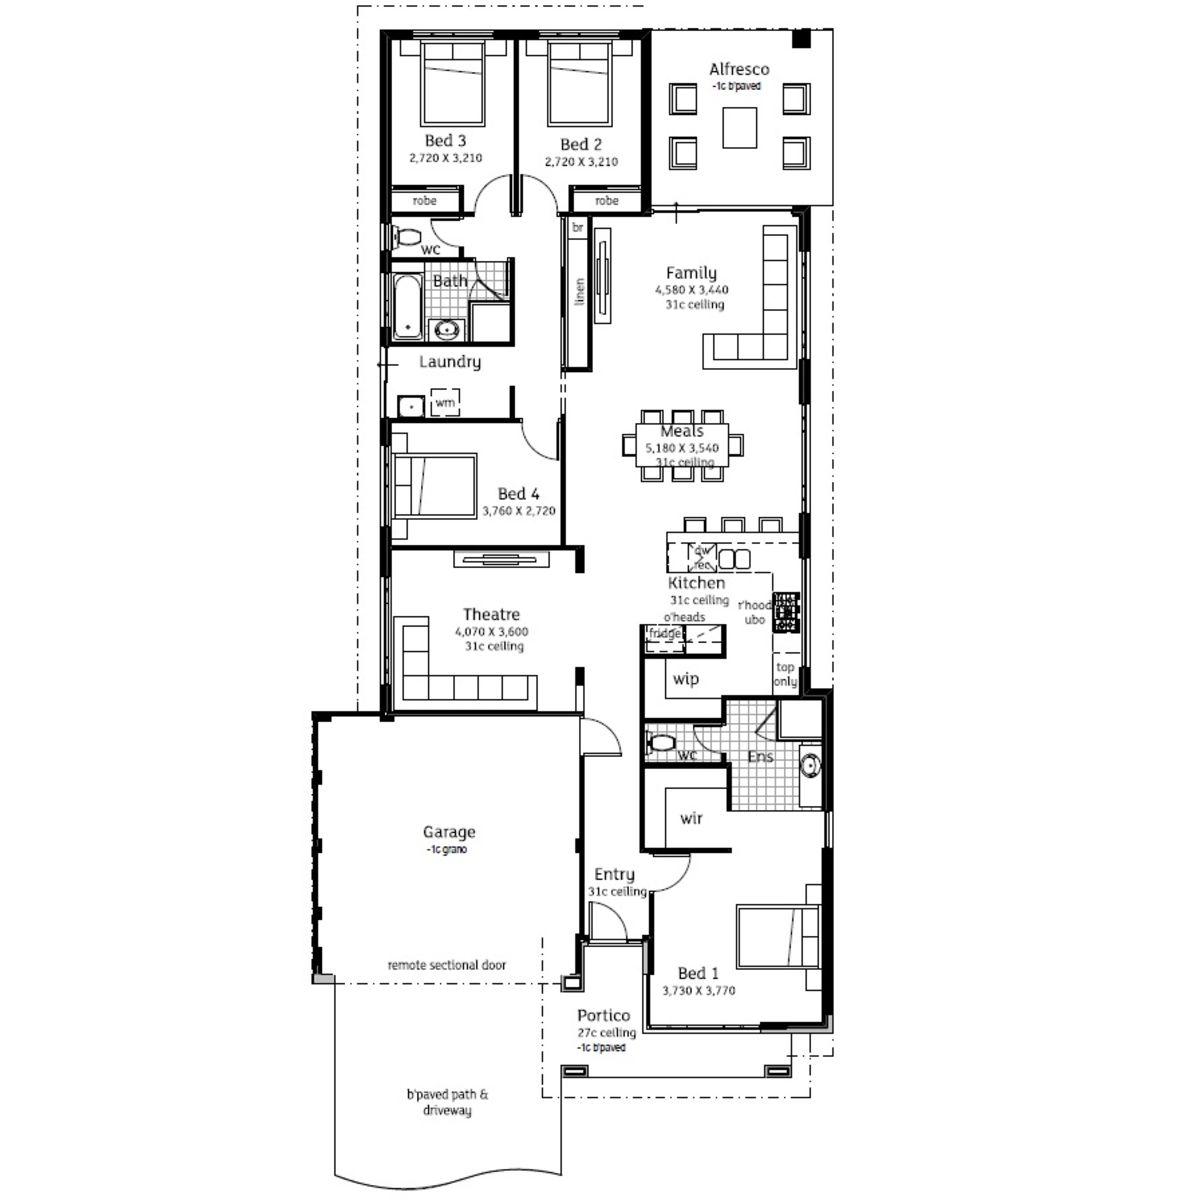 Pin By Sharni Wimbridge On 2019 House Plans Floor Plans House Blueprints House Plans